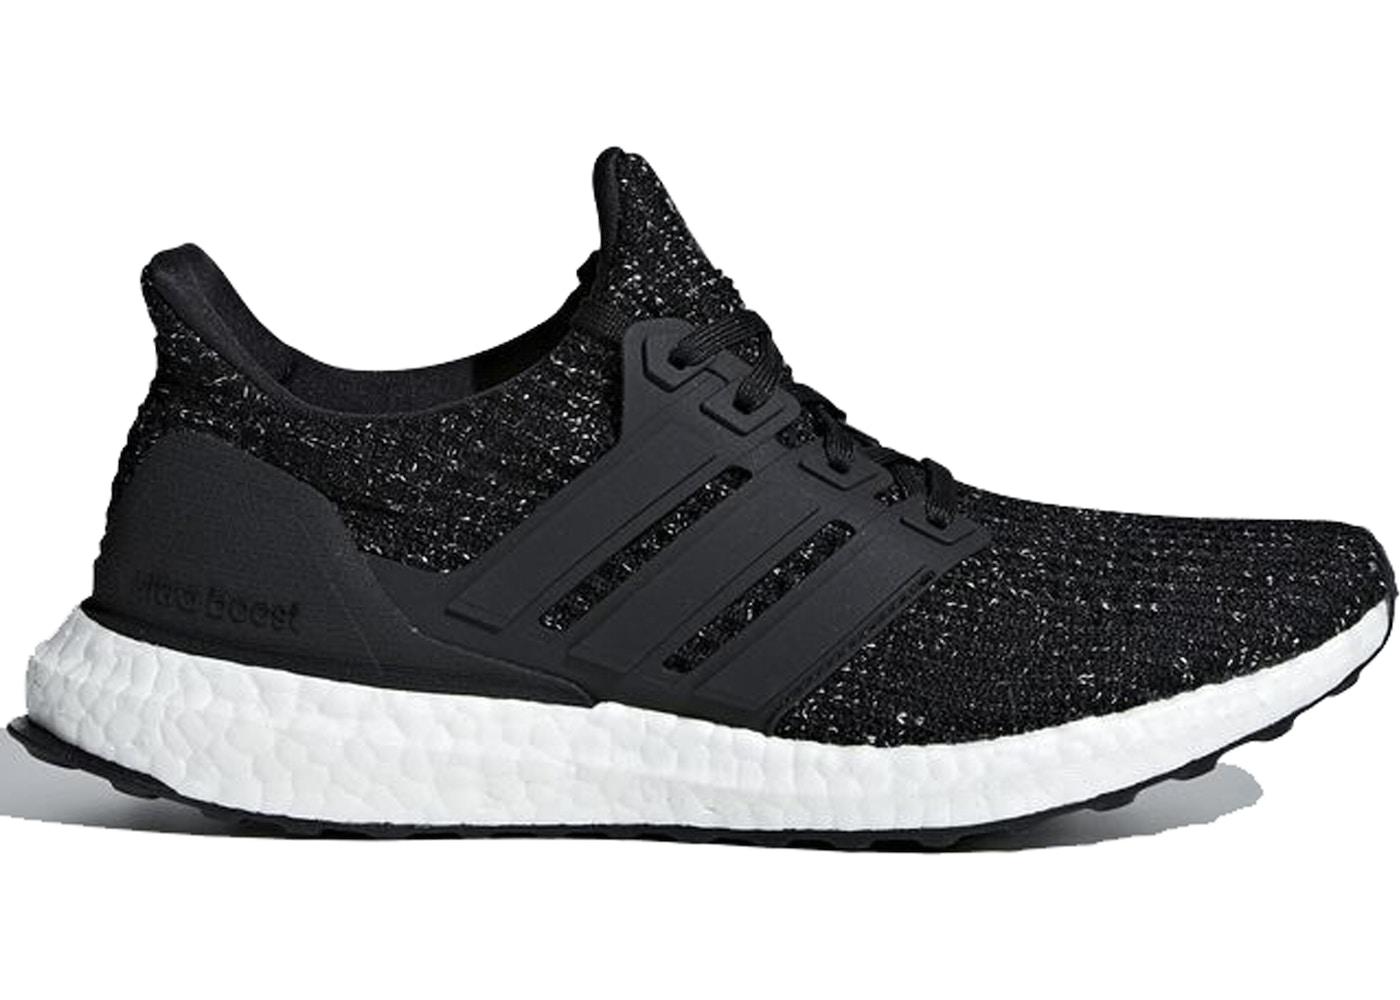 Adidas Ultra Boost - Core Black - 2015 (by oldmanalan